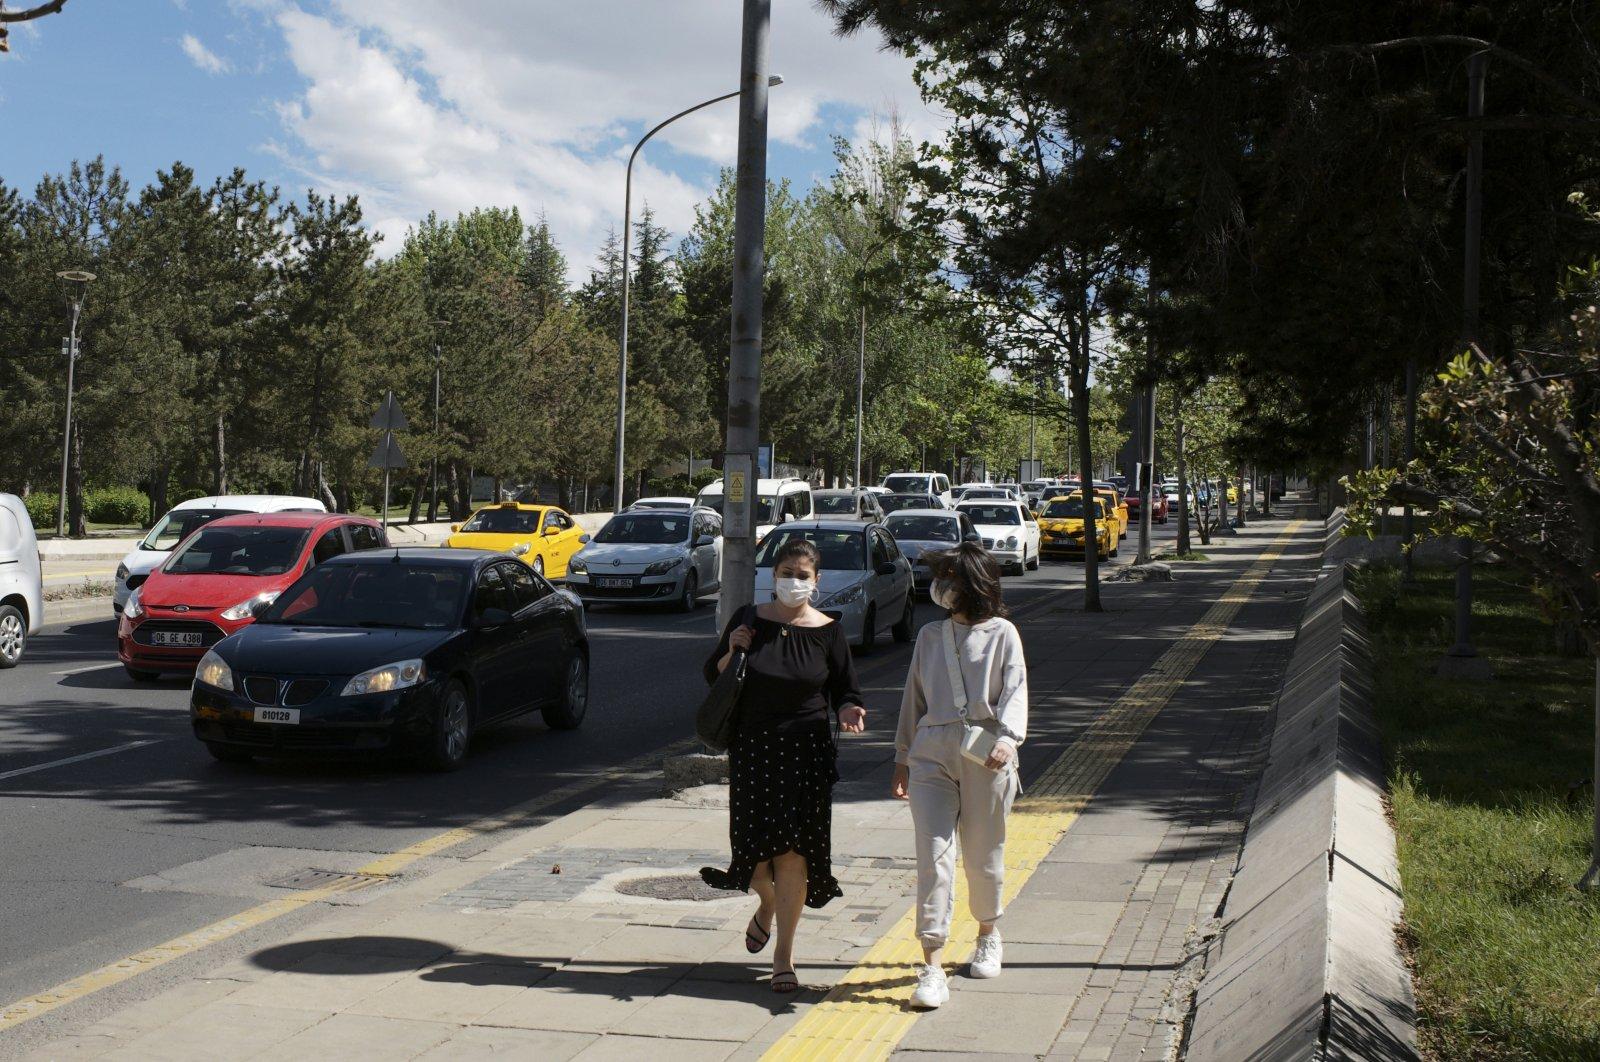 People wearing face masks walk on a street in the capital Ankara, Turkey, May 21, 2021. (AP PHOTO)